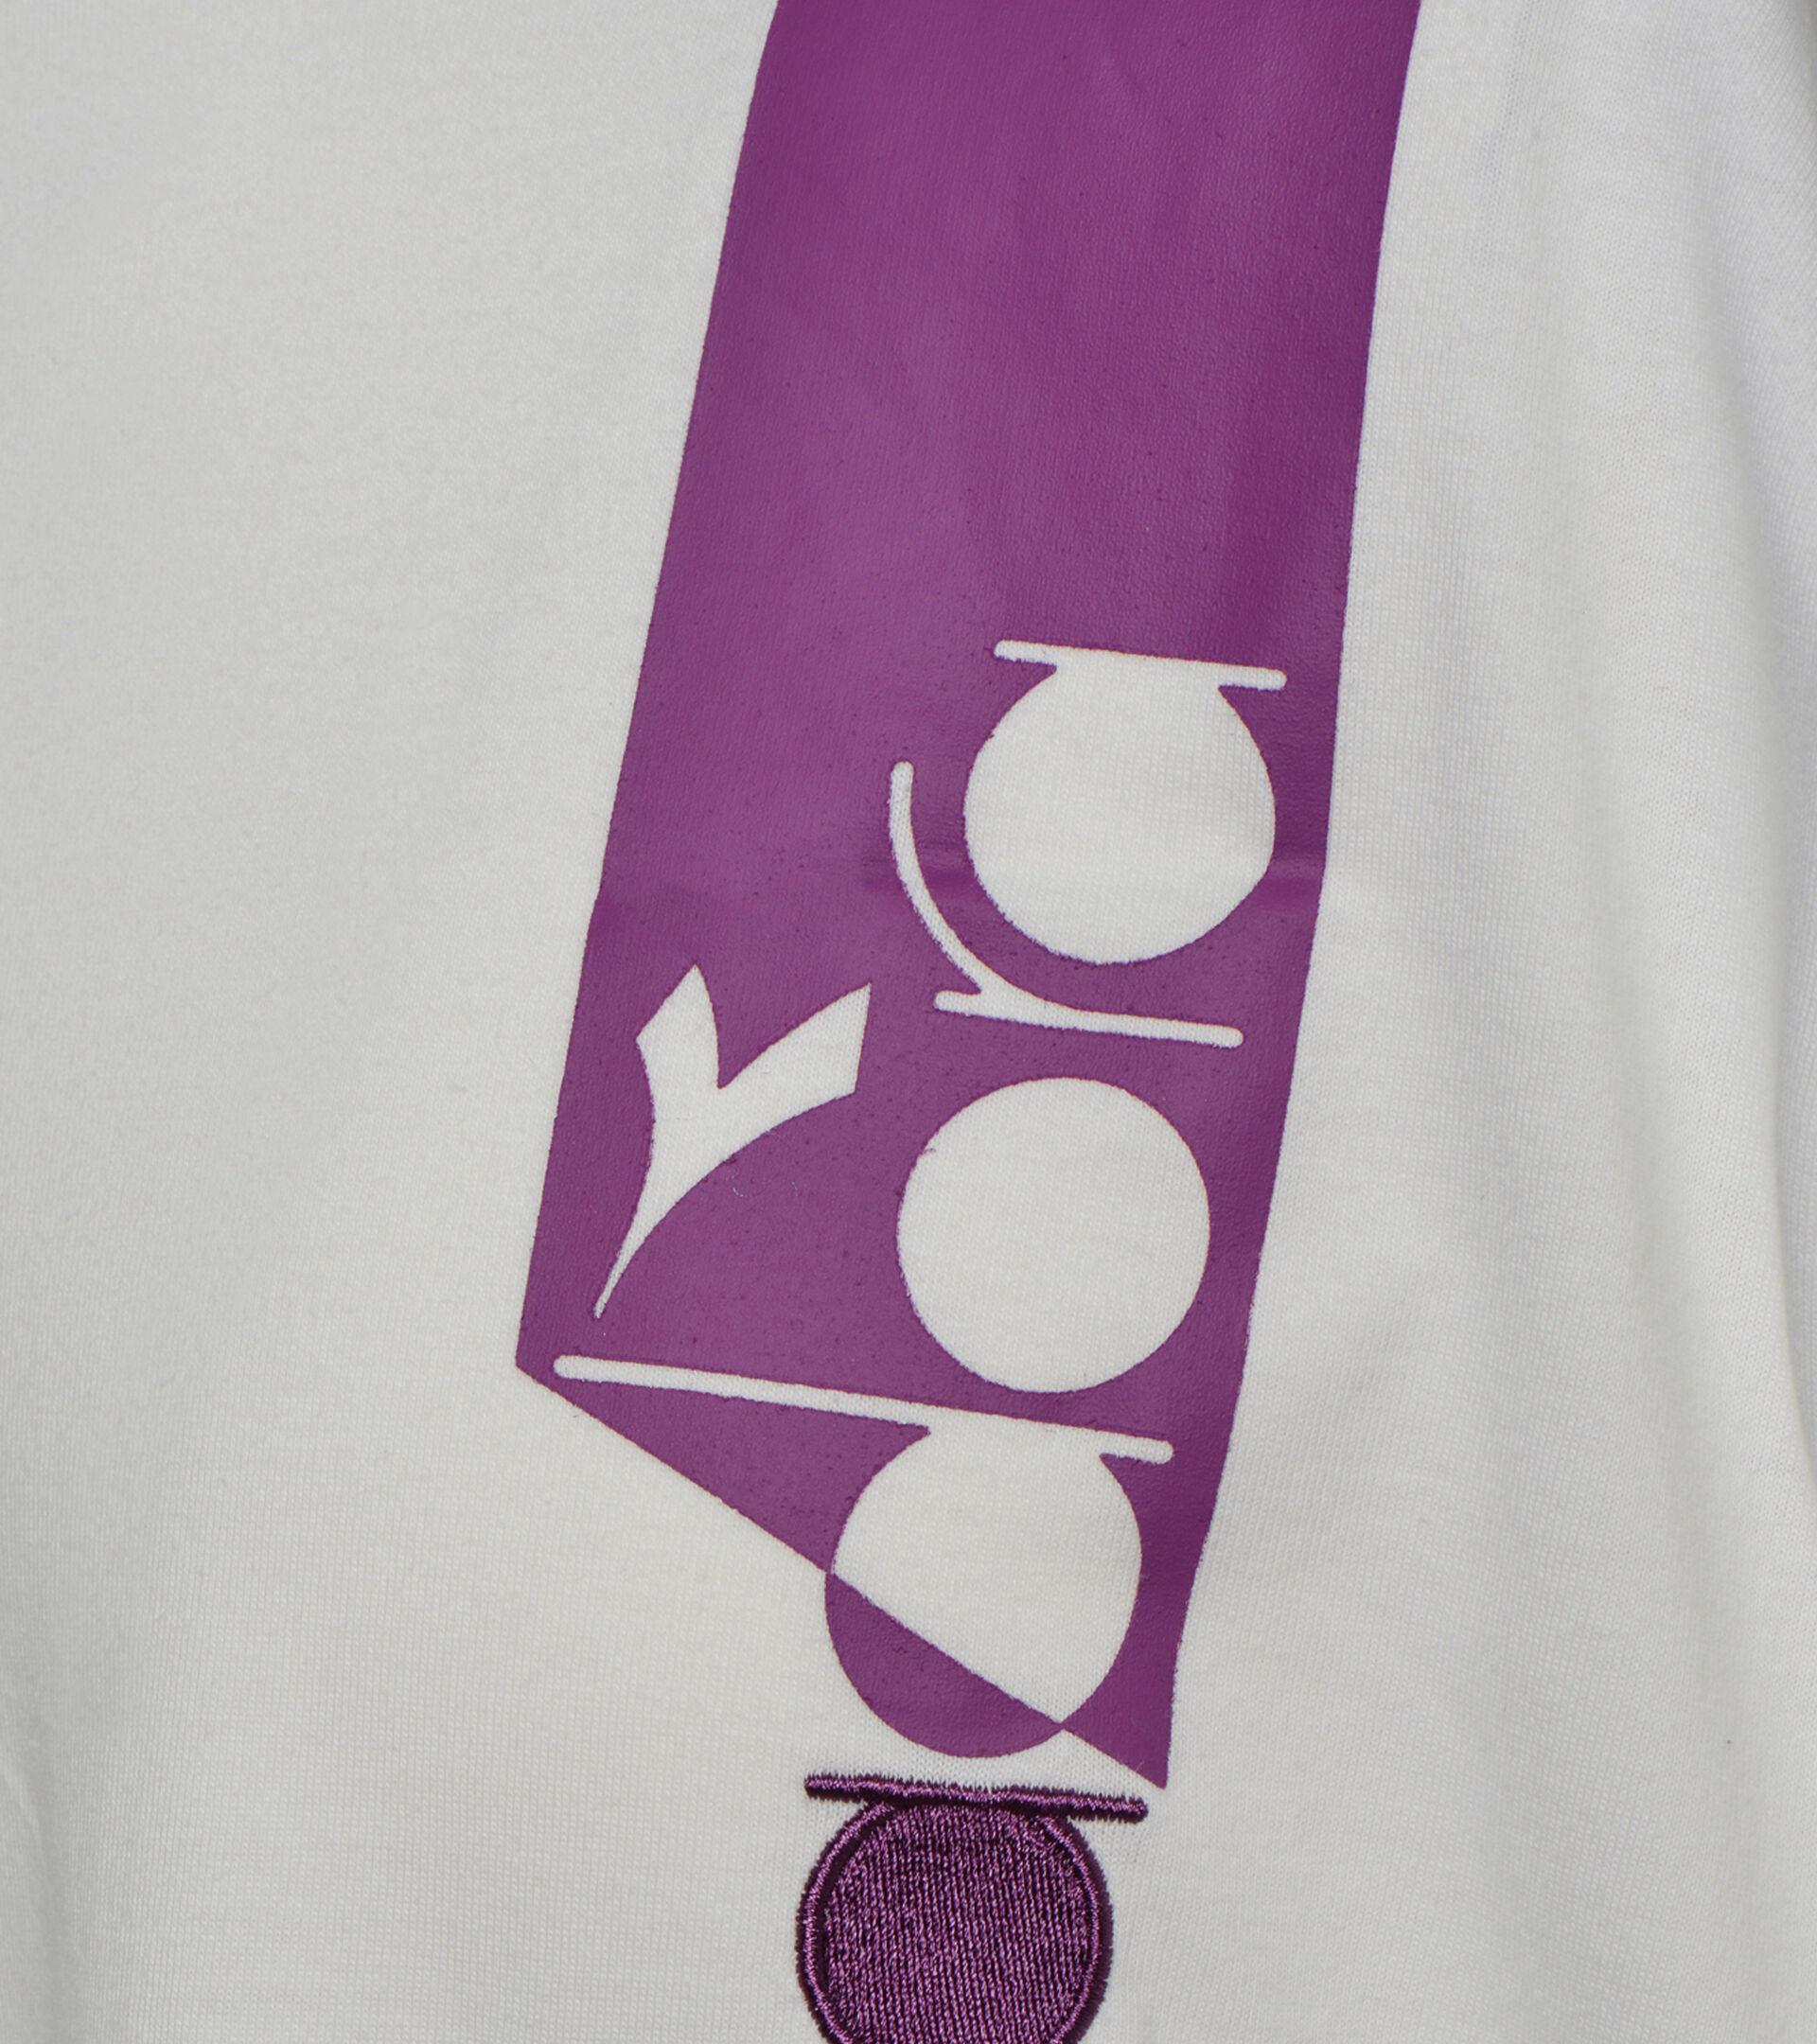 T-shirt - Unisex T-SHIRT SS ICON GLANZEND TRAUB/MILCH WSS/SCHWZ - Diadora